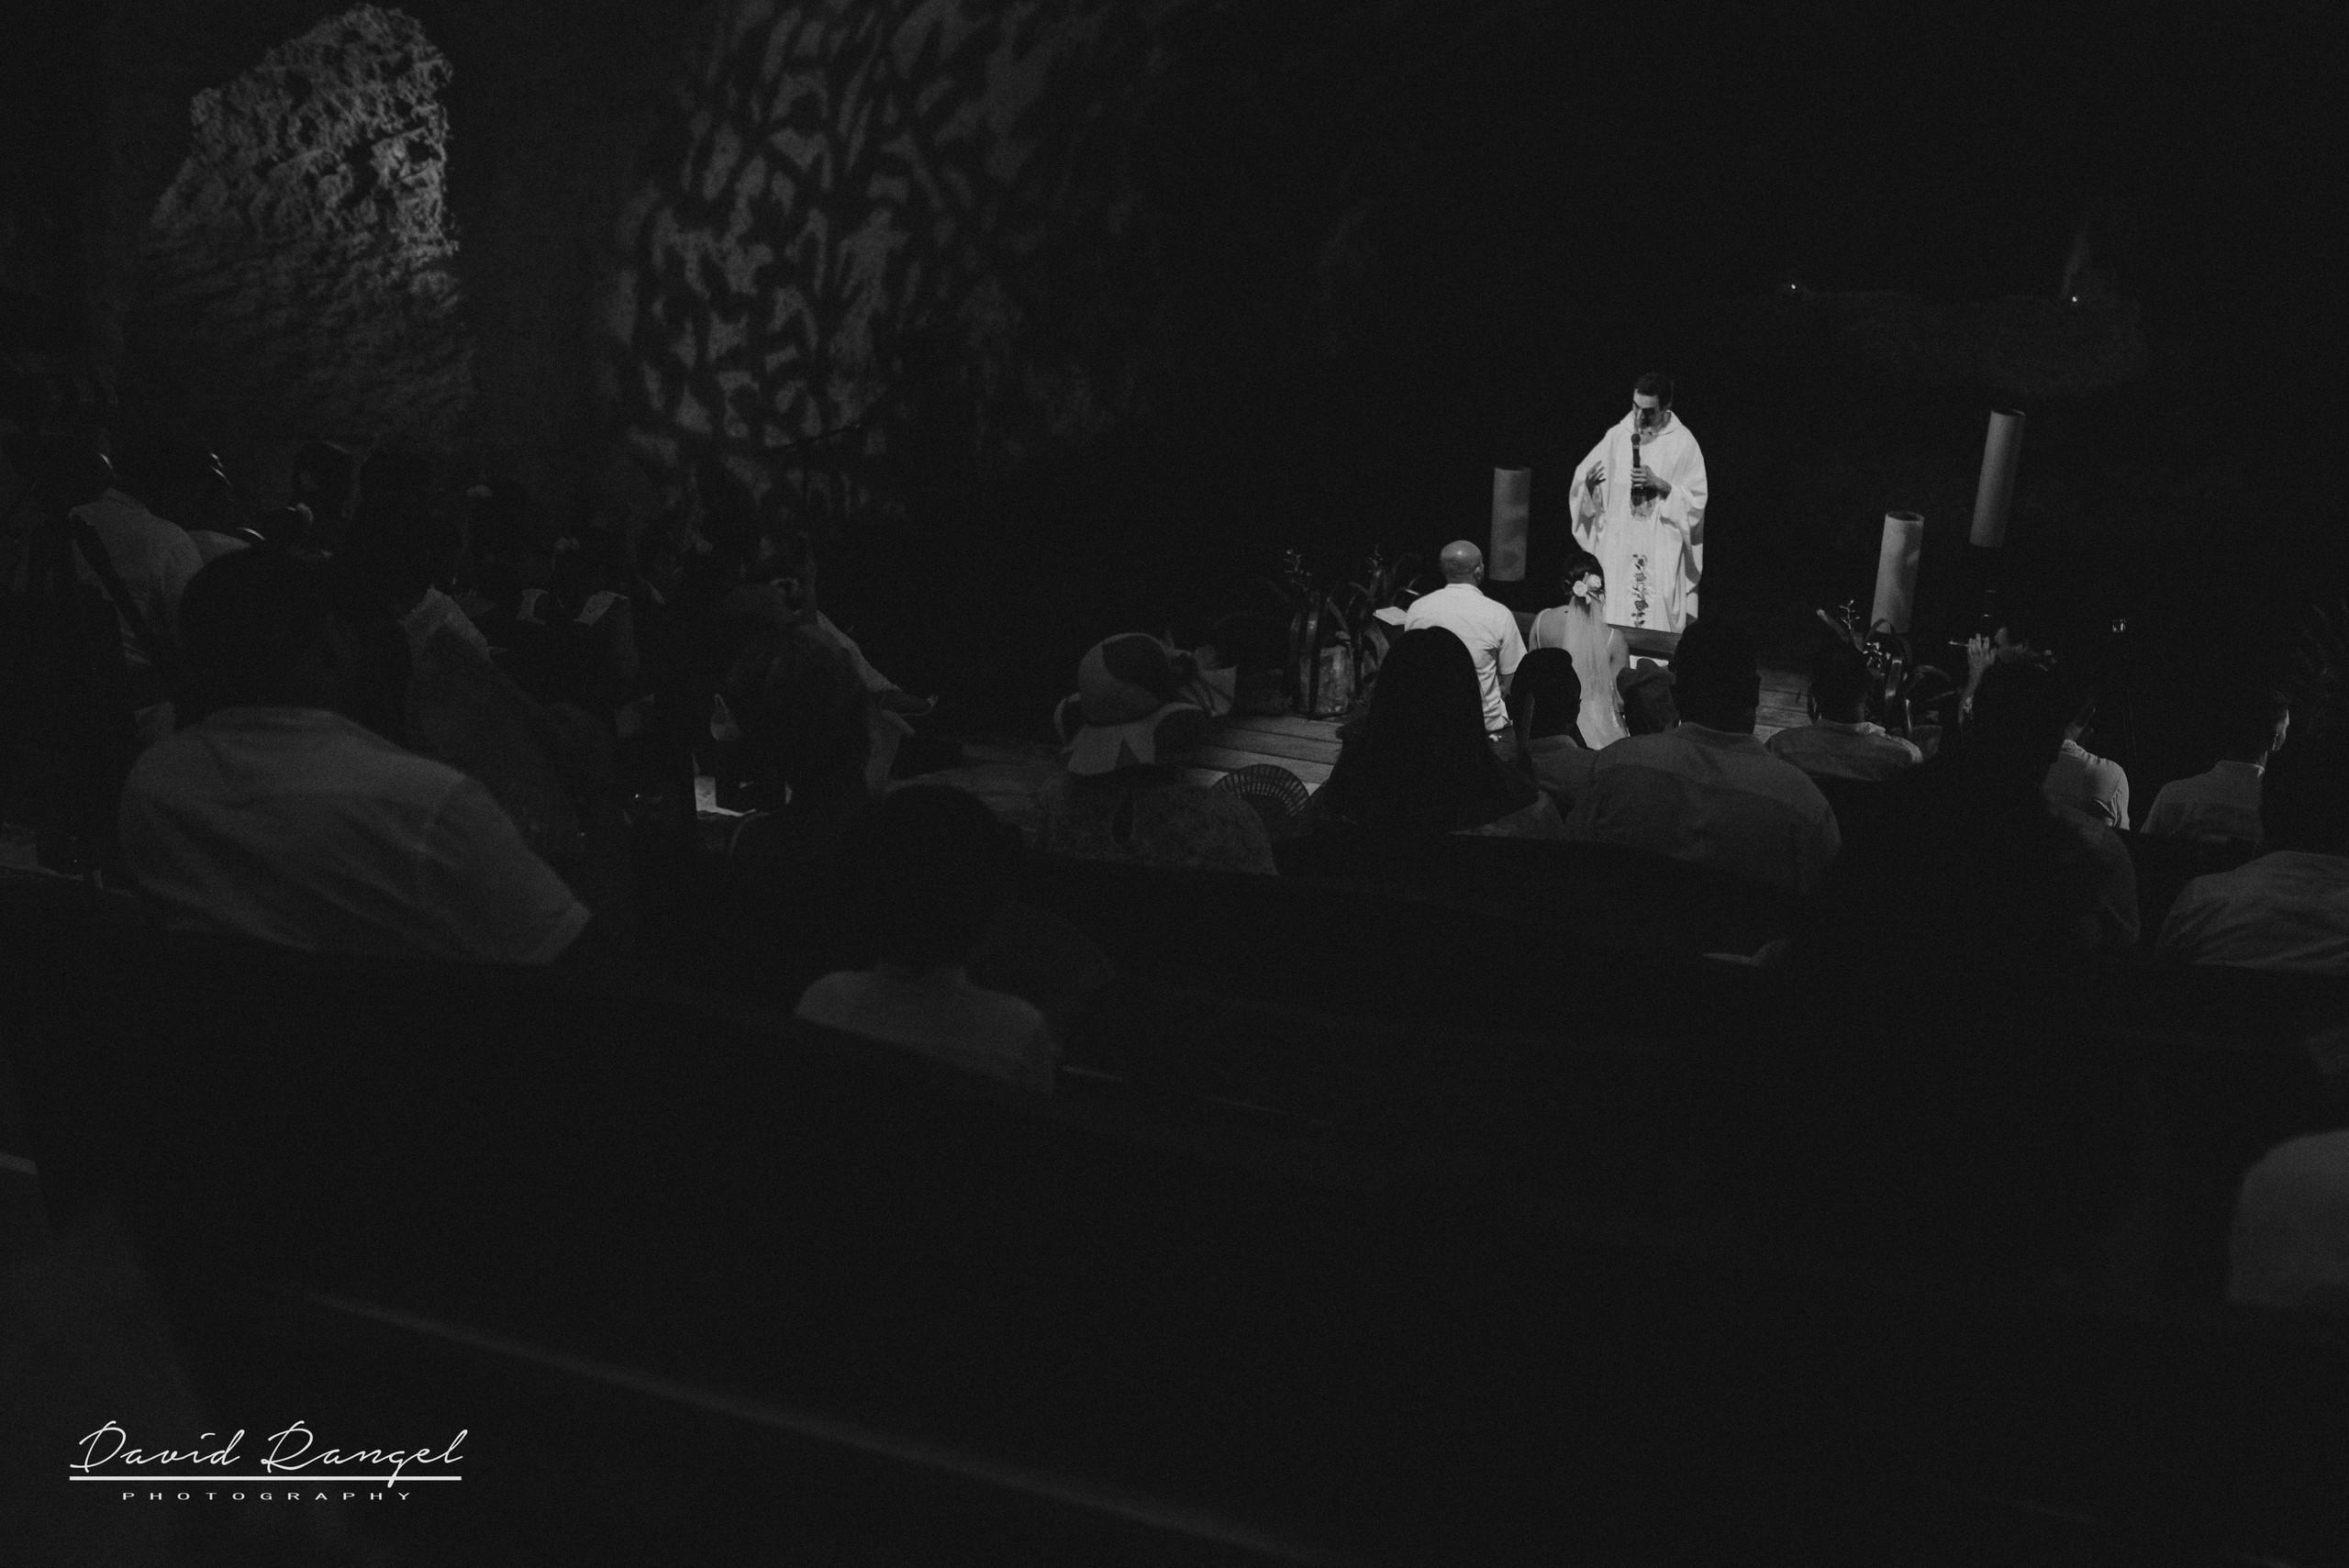 bride+groom+ceremony+minister+padre+misa+vows+cenote+wedding+panoramic+photo